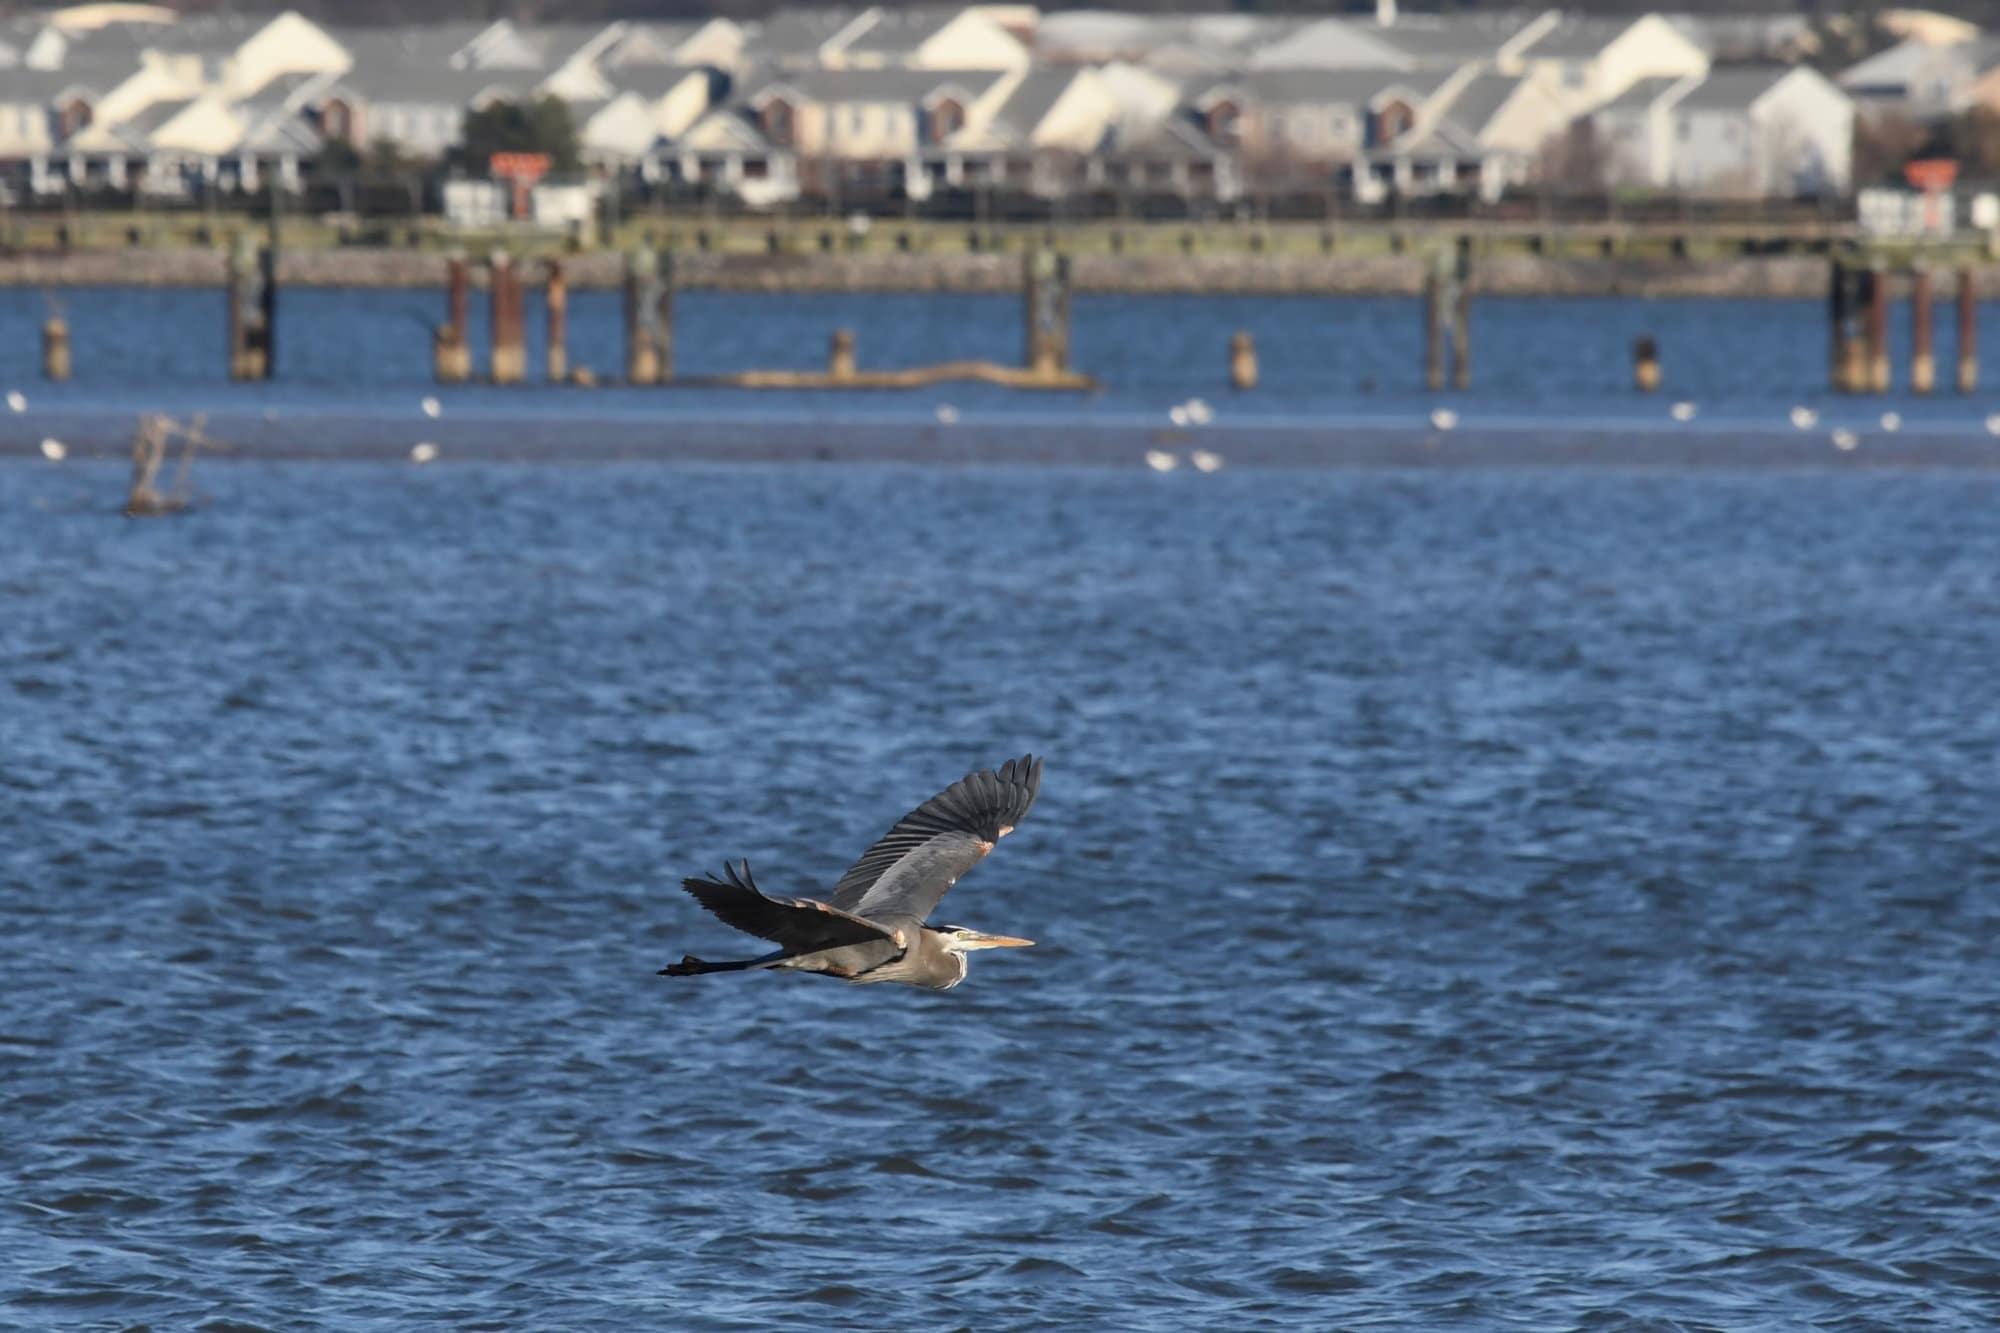 Experts warn against cutting Chesapeake Bay Program funding